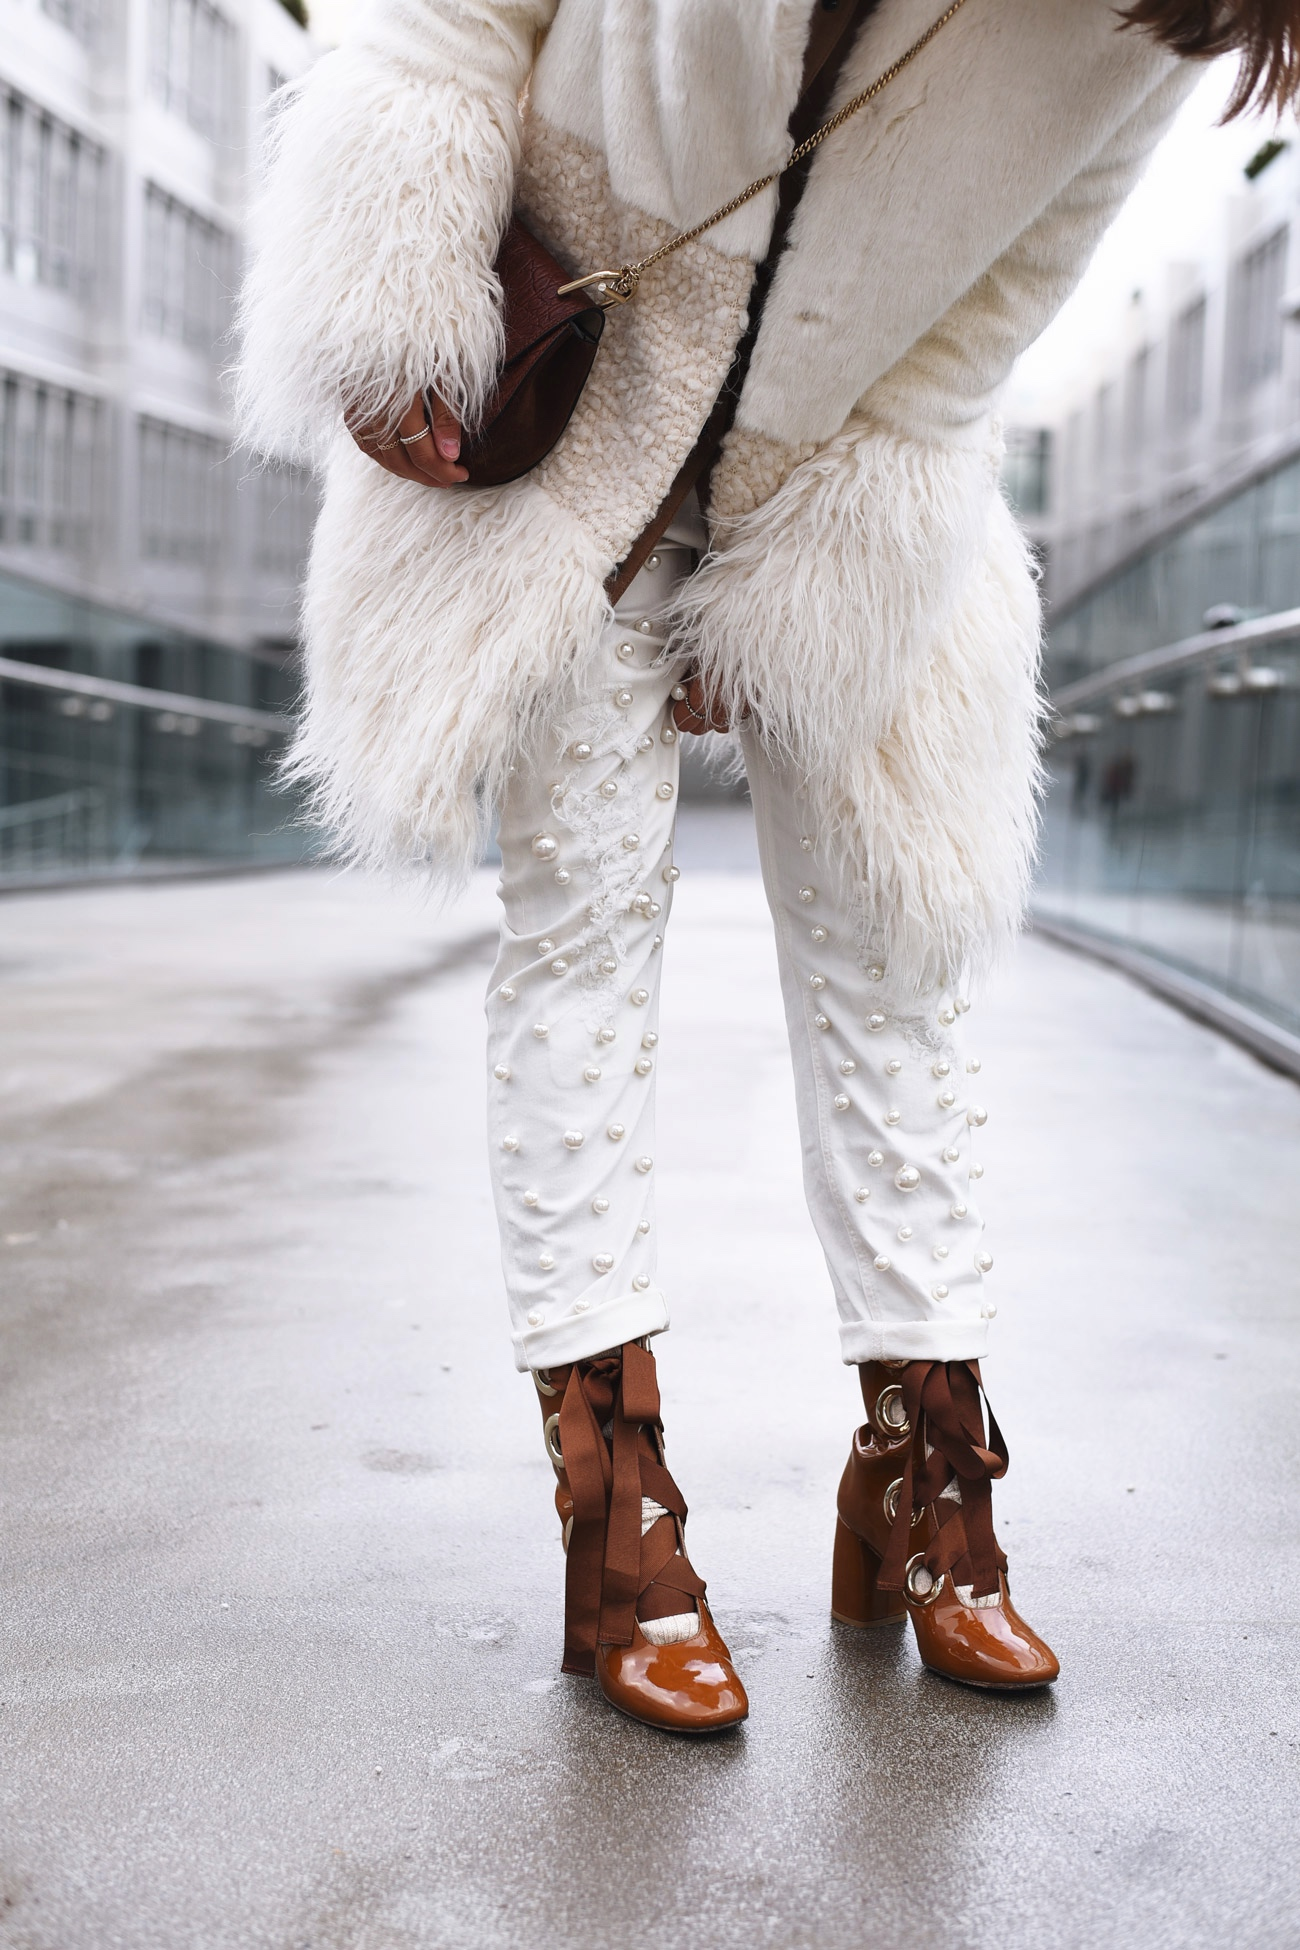 denim-with-pearls-jeanshose-mit-perlen-escada-sport-blogger-streetstyle-nina-fashiioncarpet